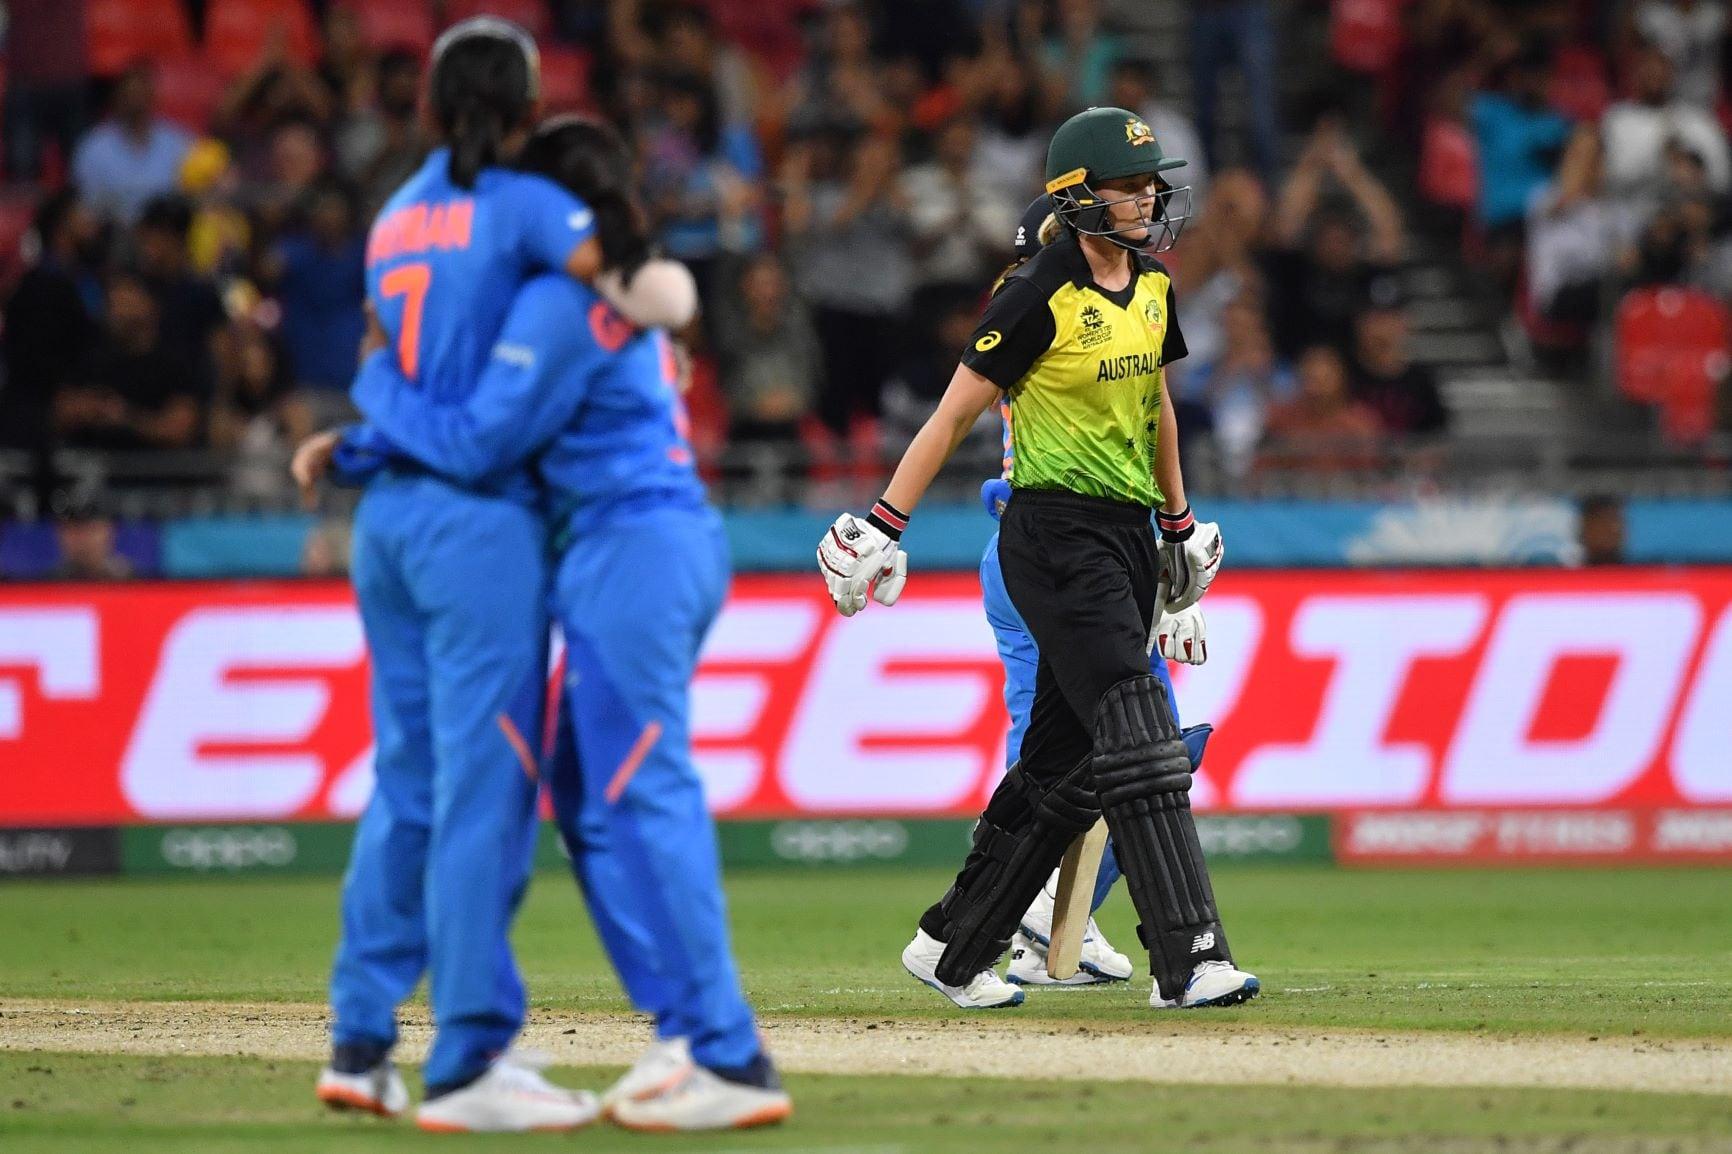 In Pics: India Win ICC Women's T20 World Cup Opener Against Australia